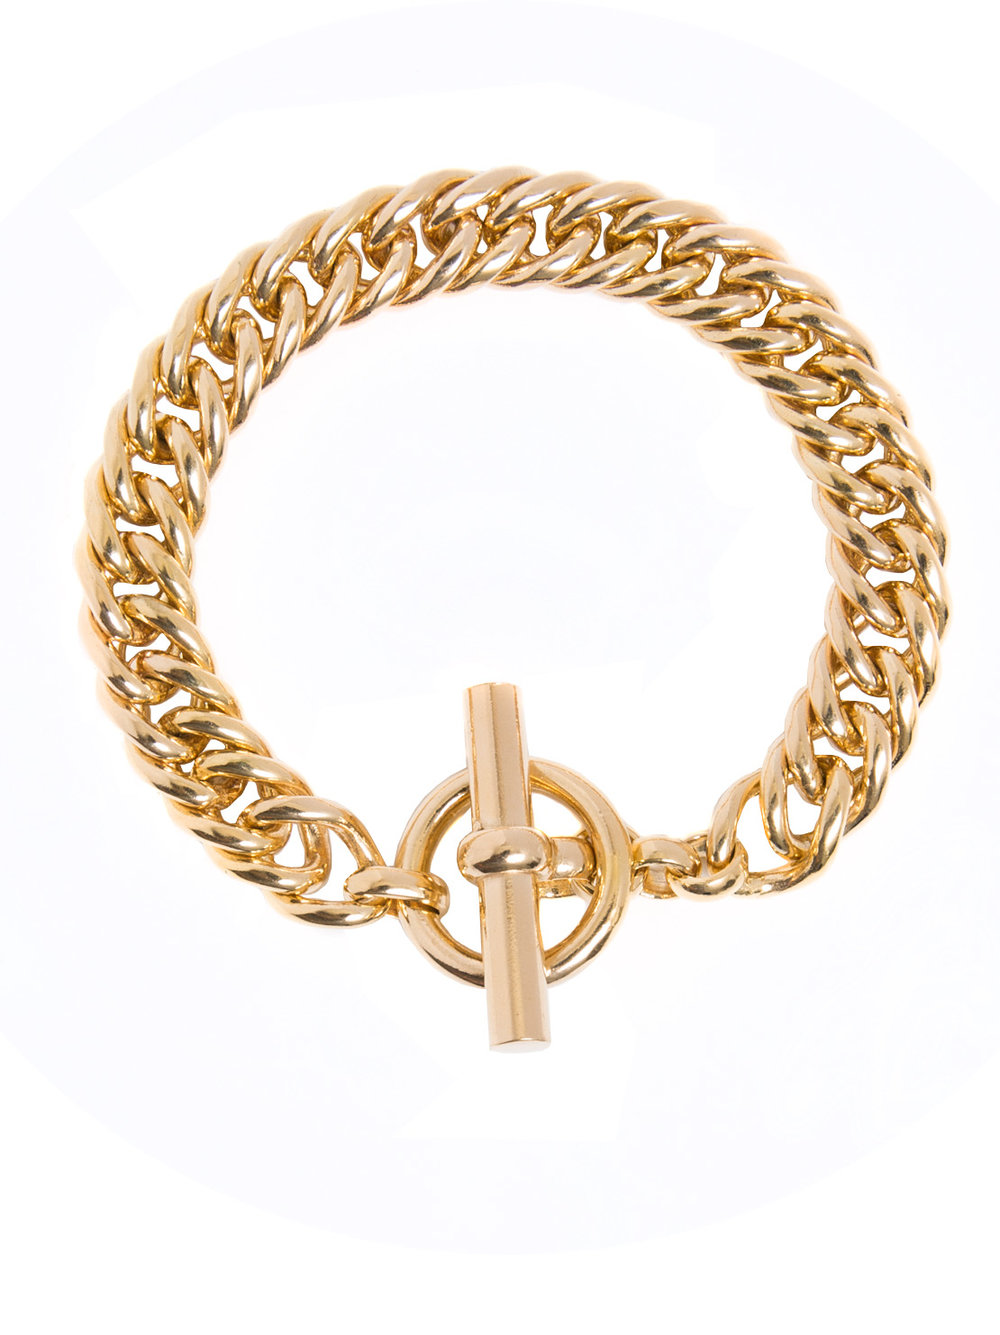 tsj0573-large-gold-curb-chain-bracelet-copy.jpg